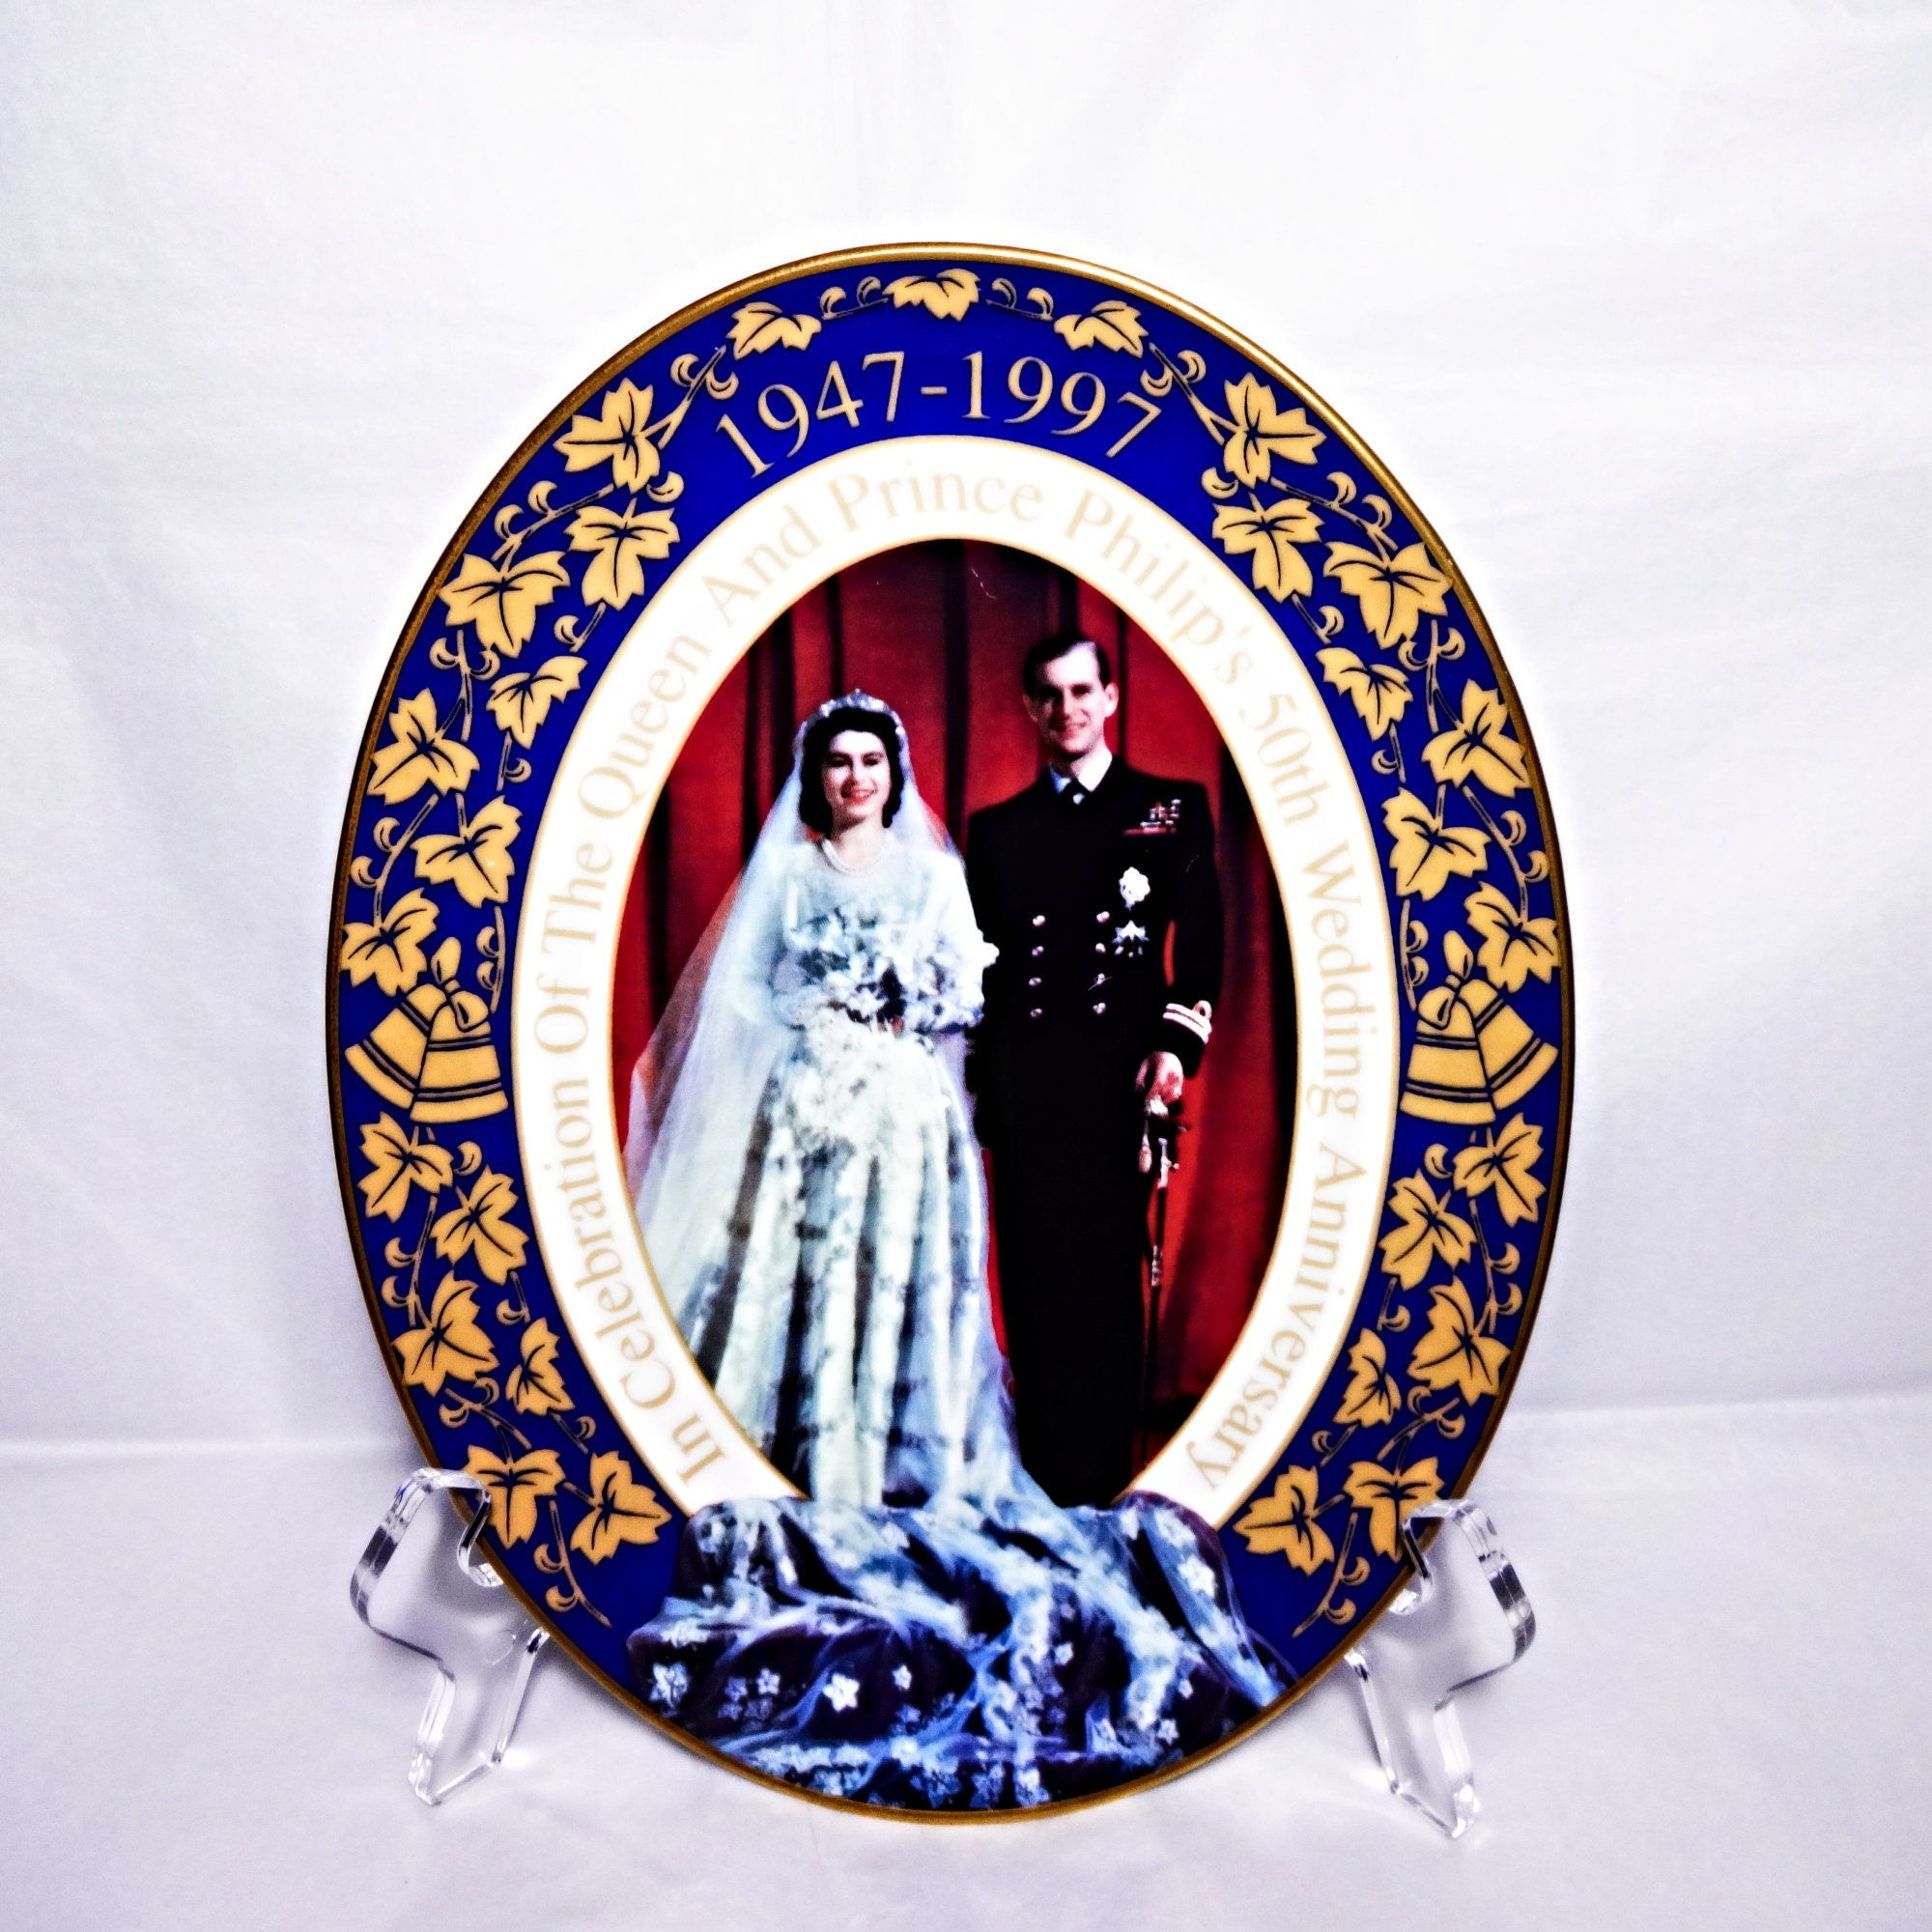 The Queen Prince Philip Royal Worcester 50th Wedding Etsy 50th Wedding 50th Wedding Anniversary Golden Wedding Anniversary